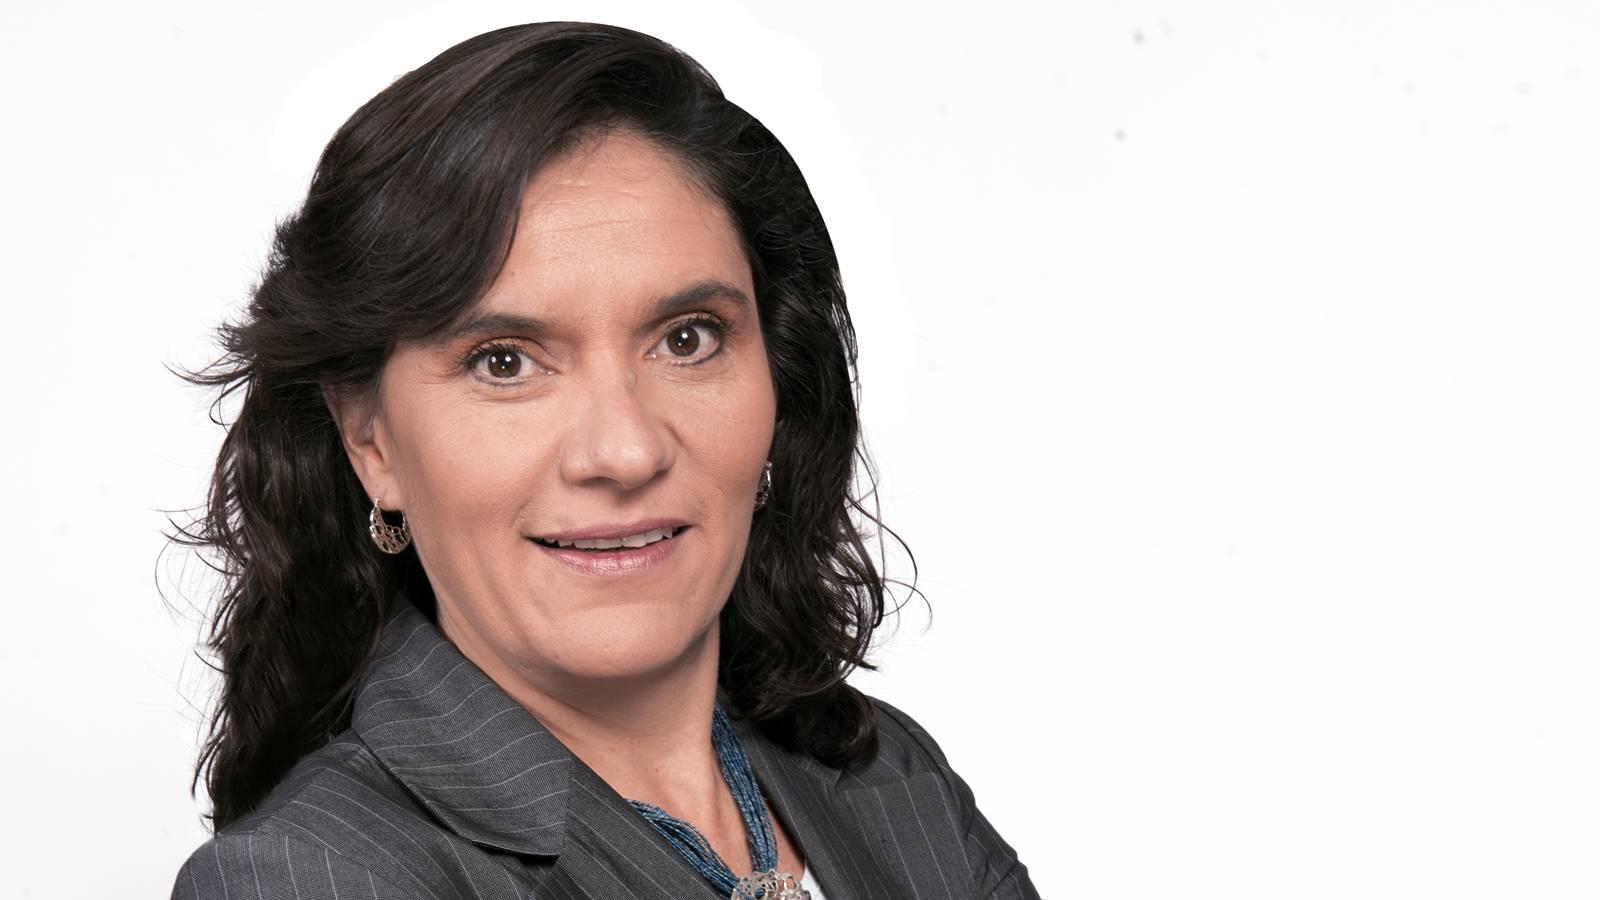 Mastercard nombra a Laura Cruz directora general para México